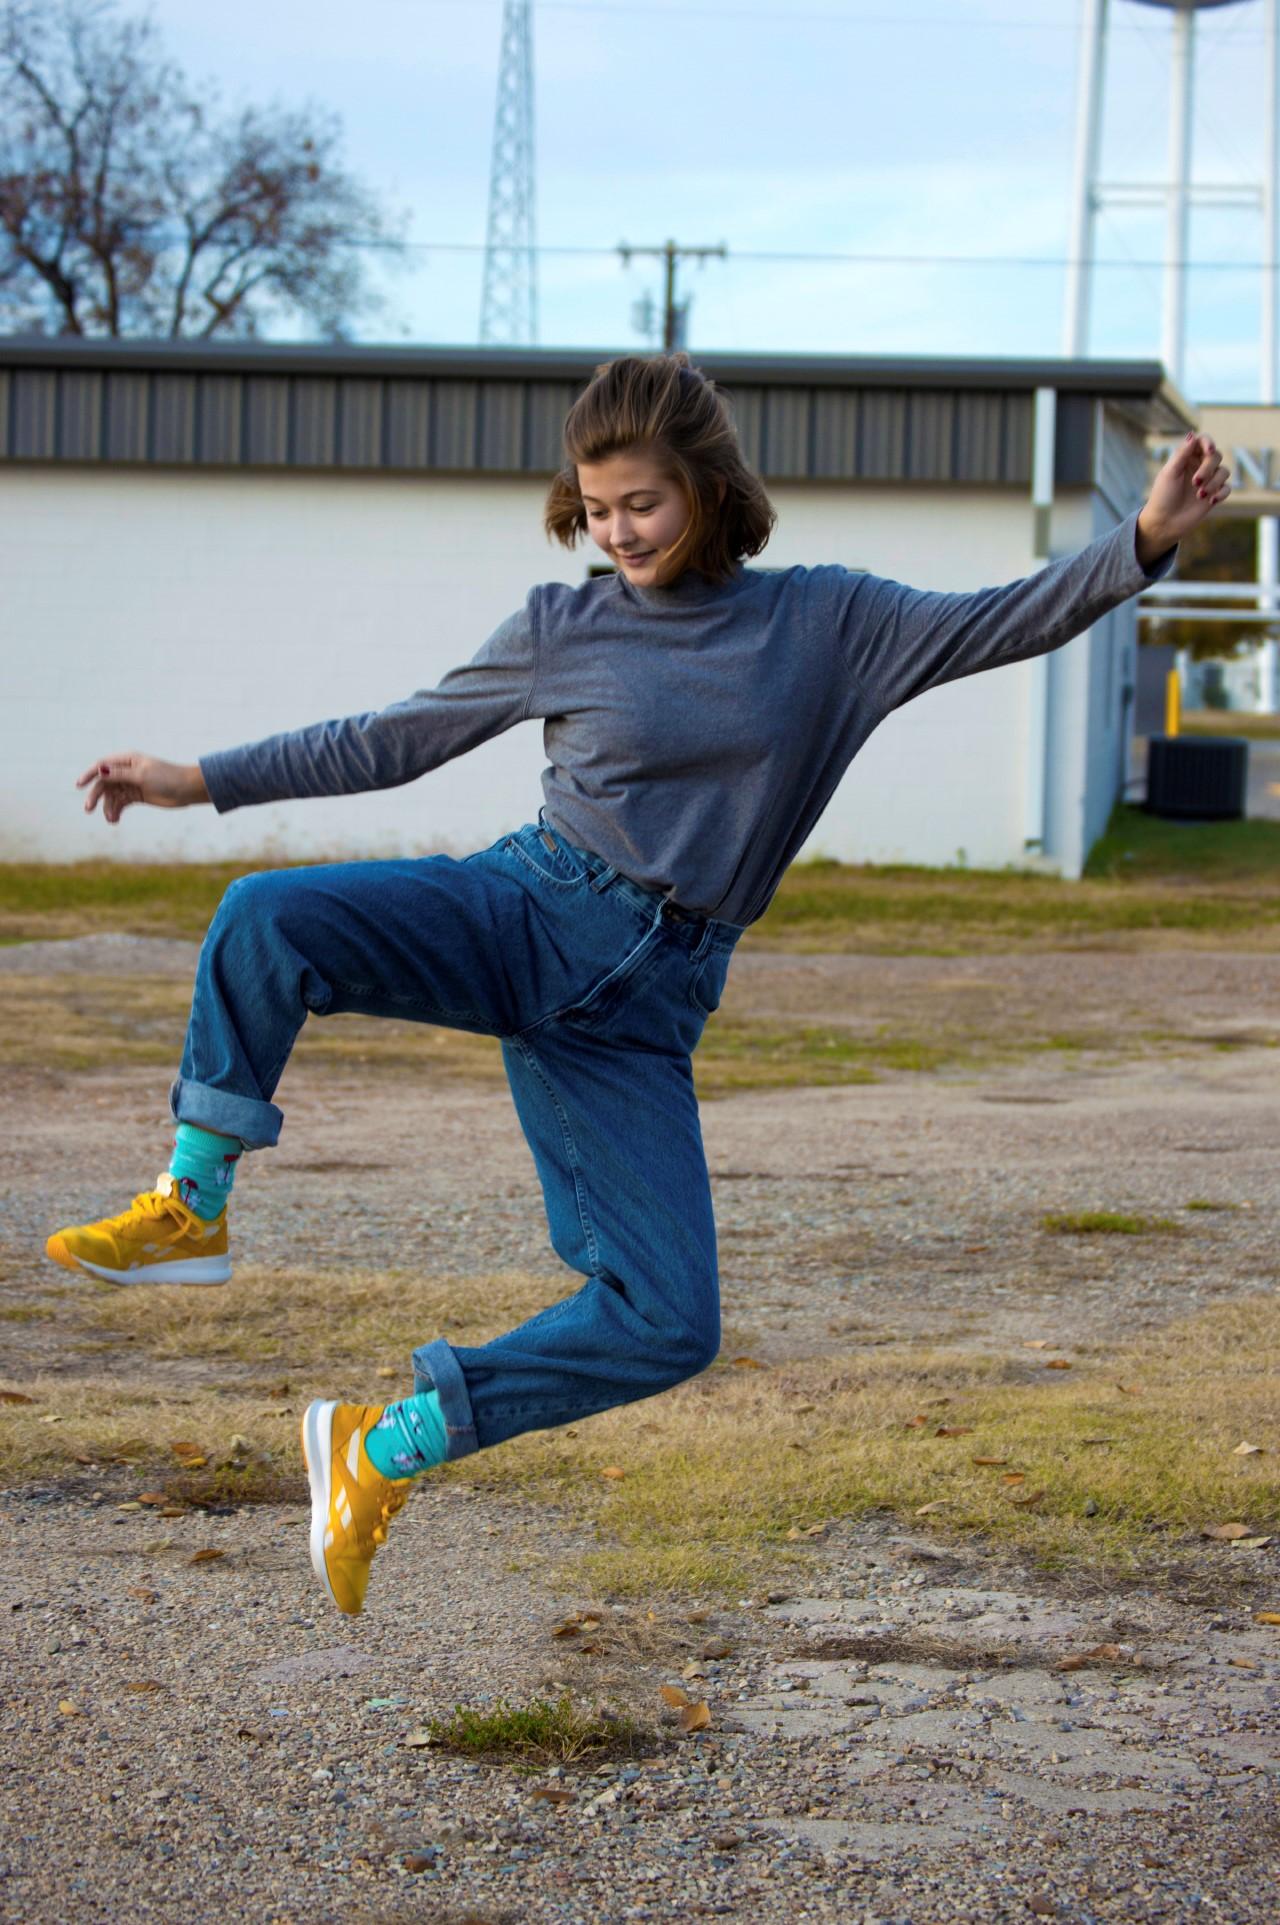 Riley Johnston, Llama Socks